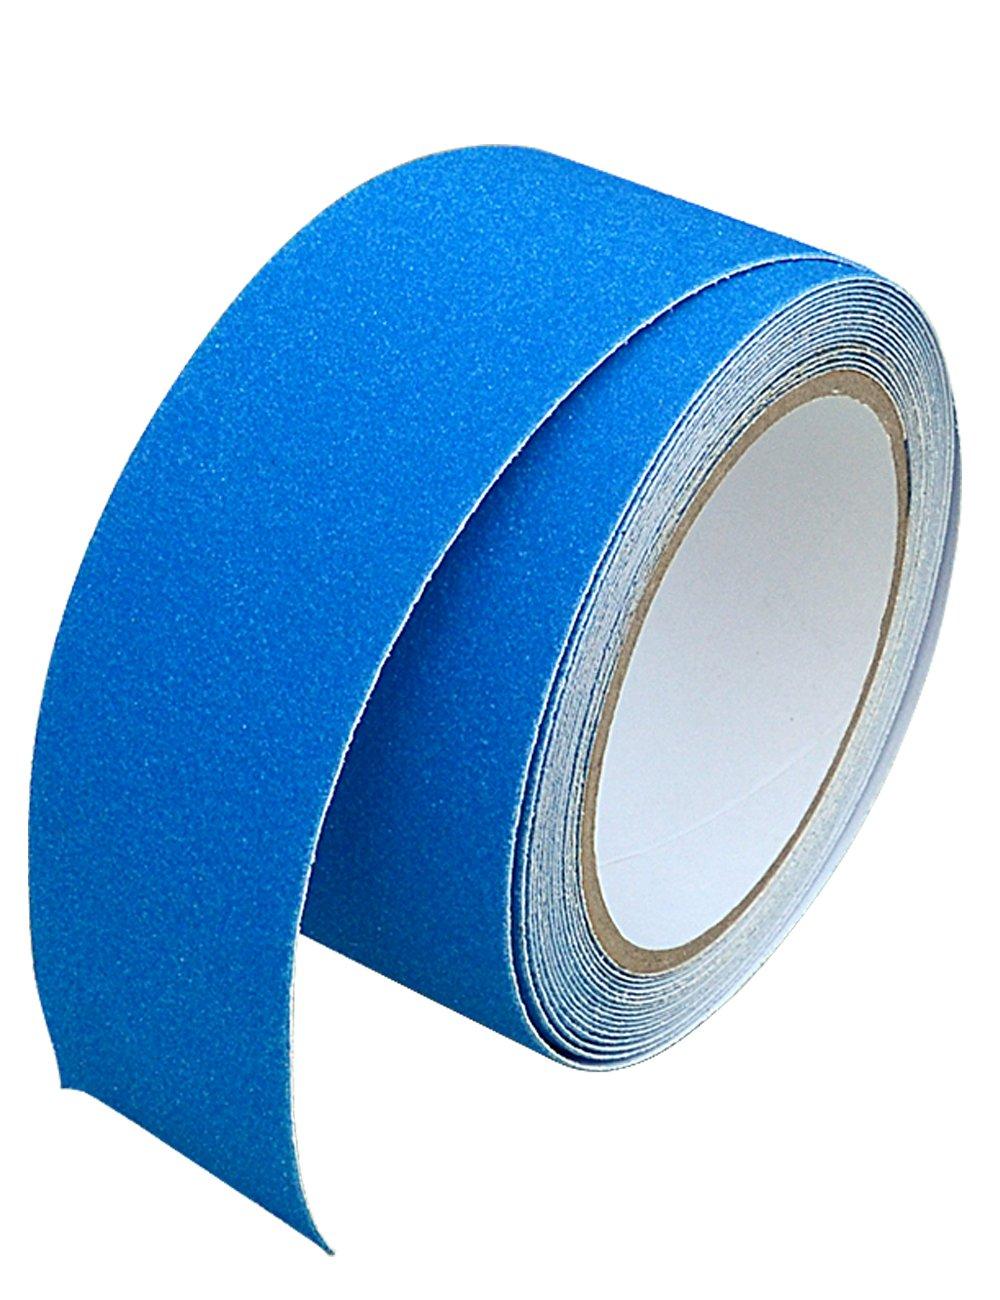 Lilaike Blue Anti Slip Tape 2 Inch by